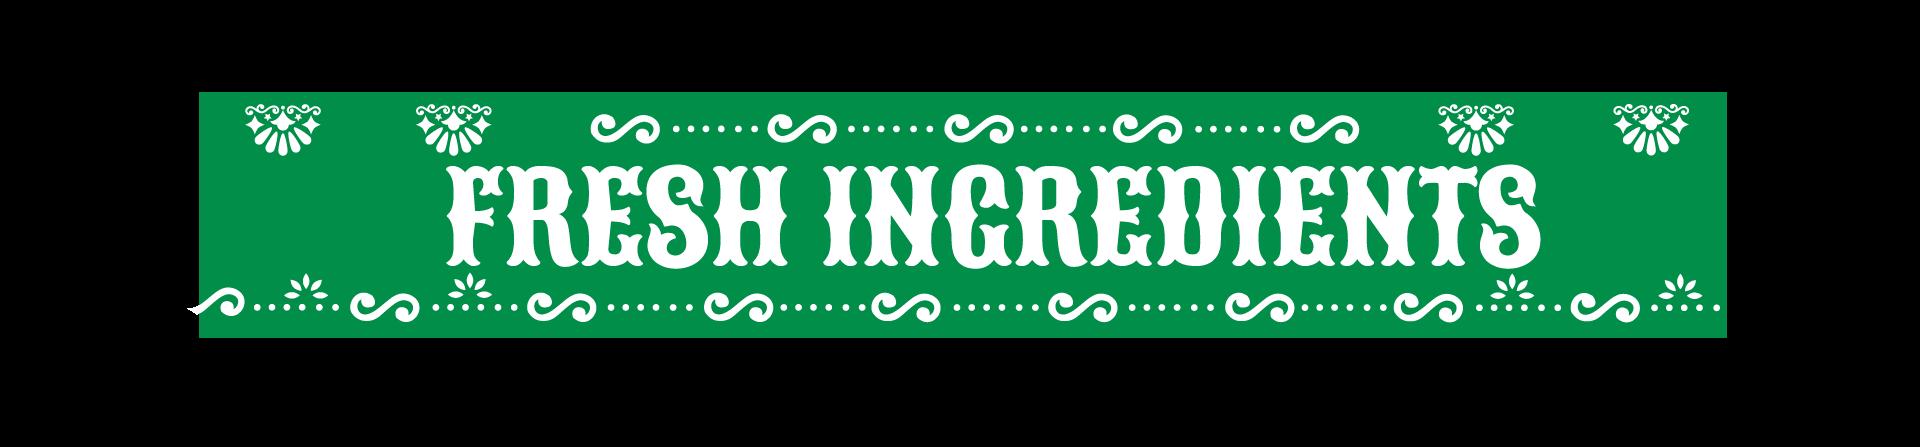 Fresh-Ingredients-Title